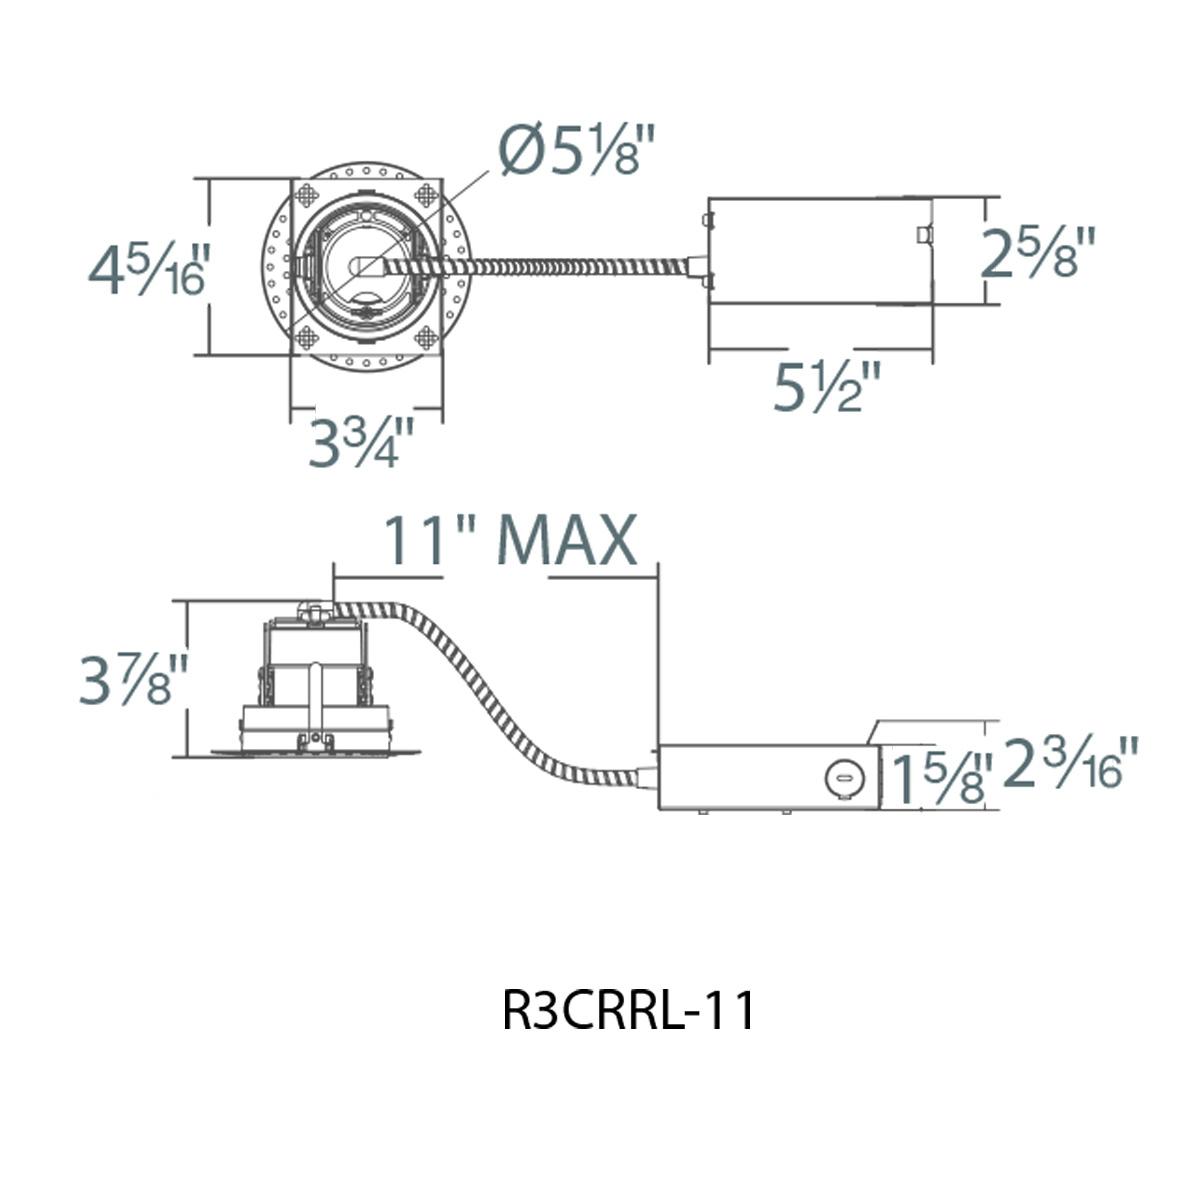 oculux-architectural-3-5-3